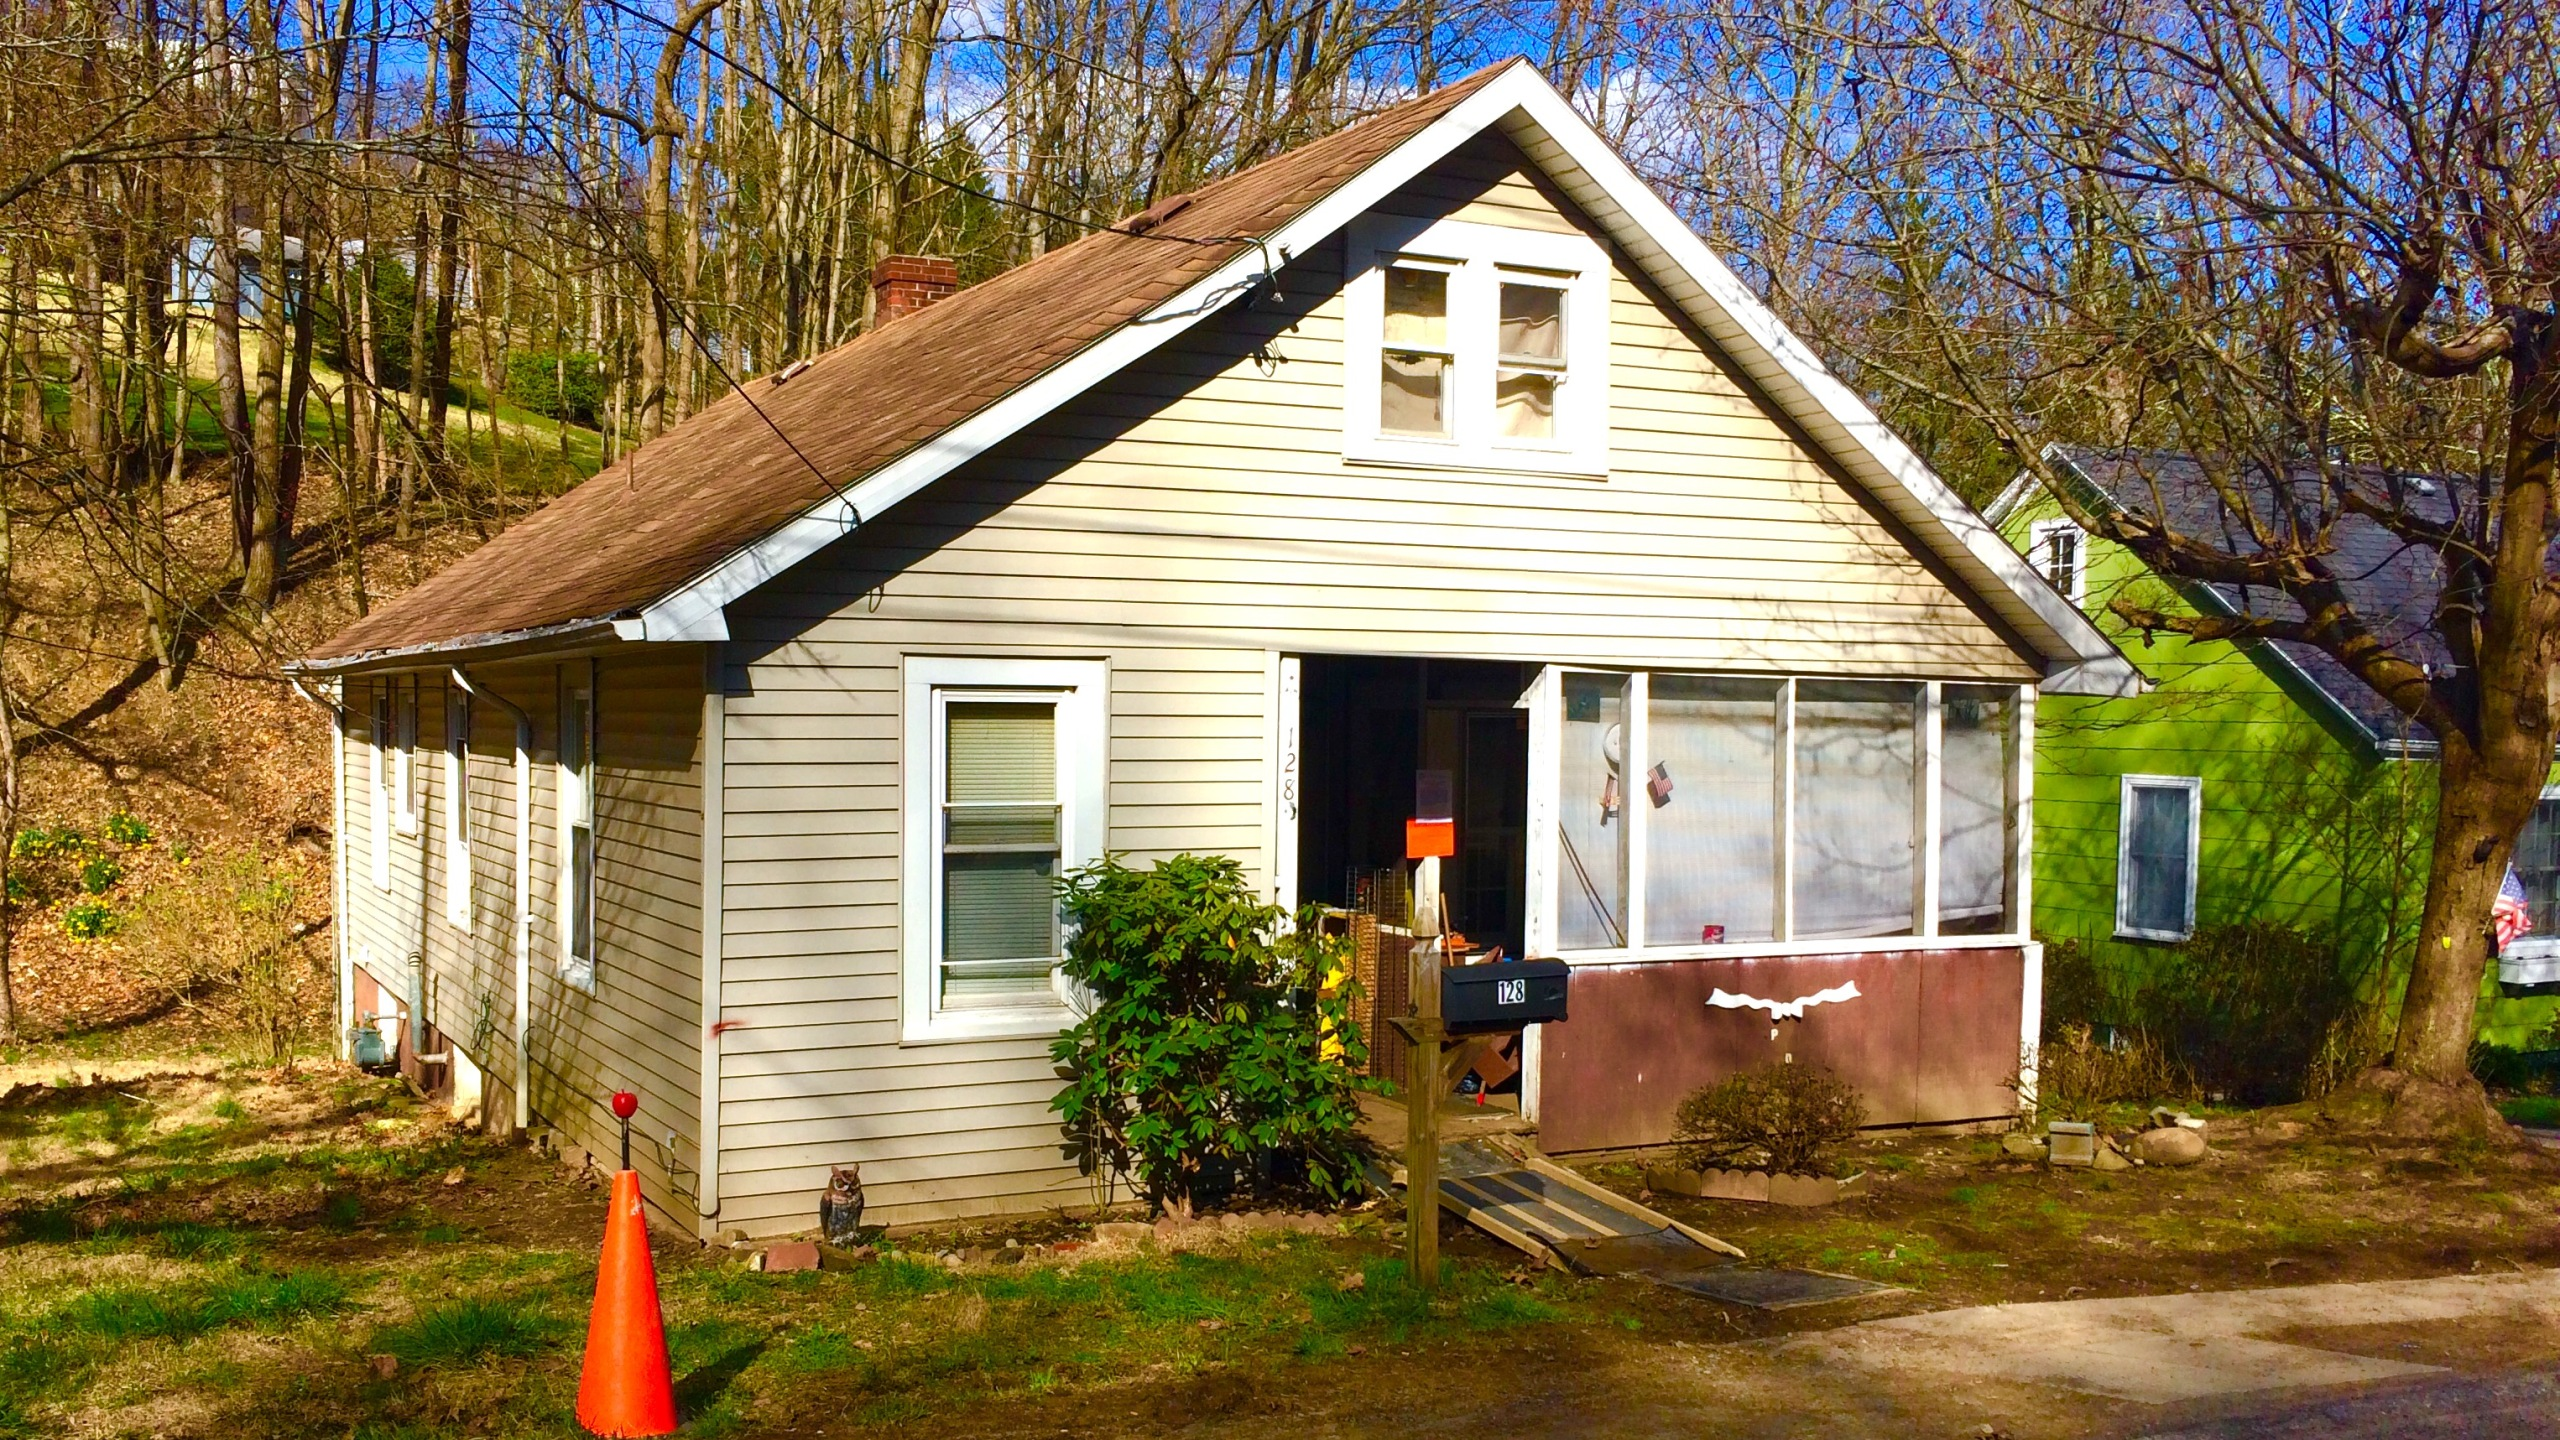 Clarksburg Drug House Winding Way_1522962263592.jpg